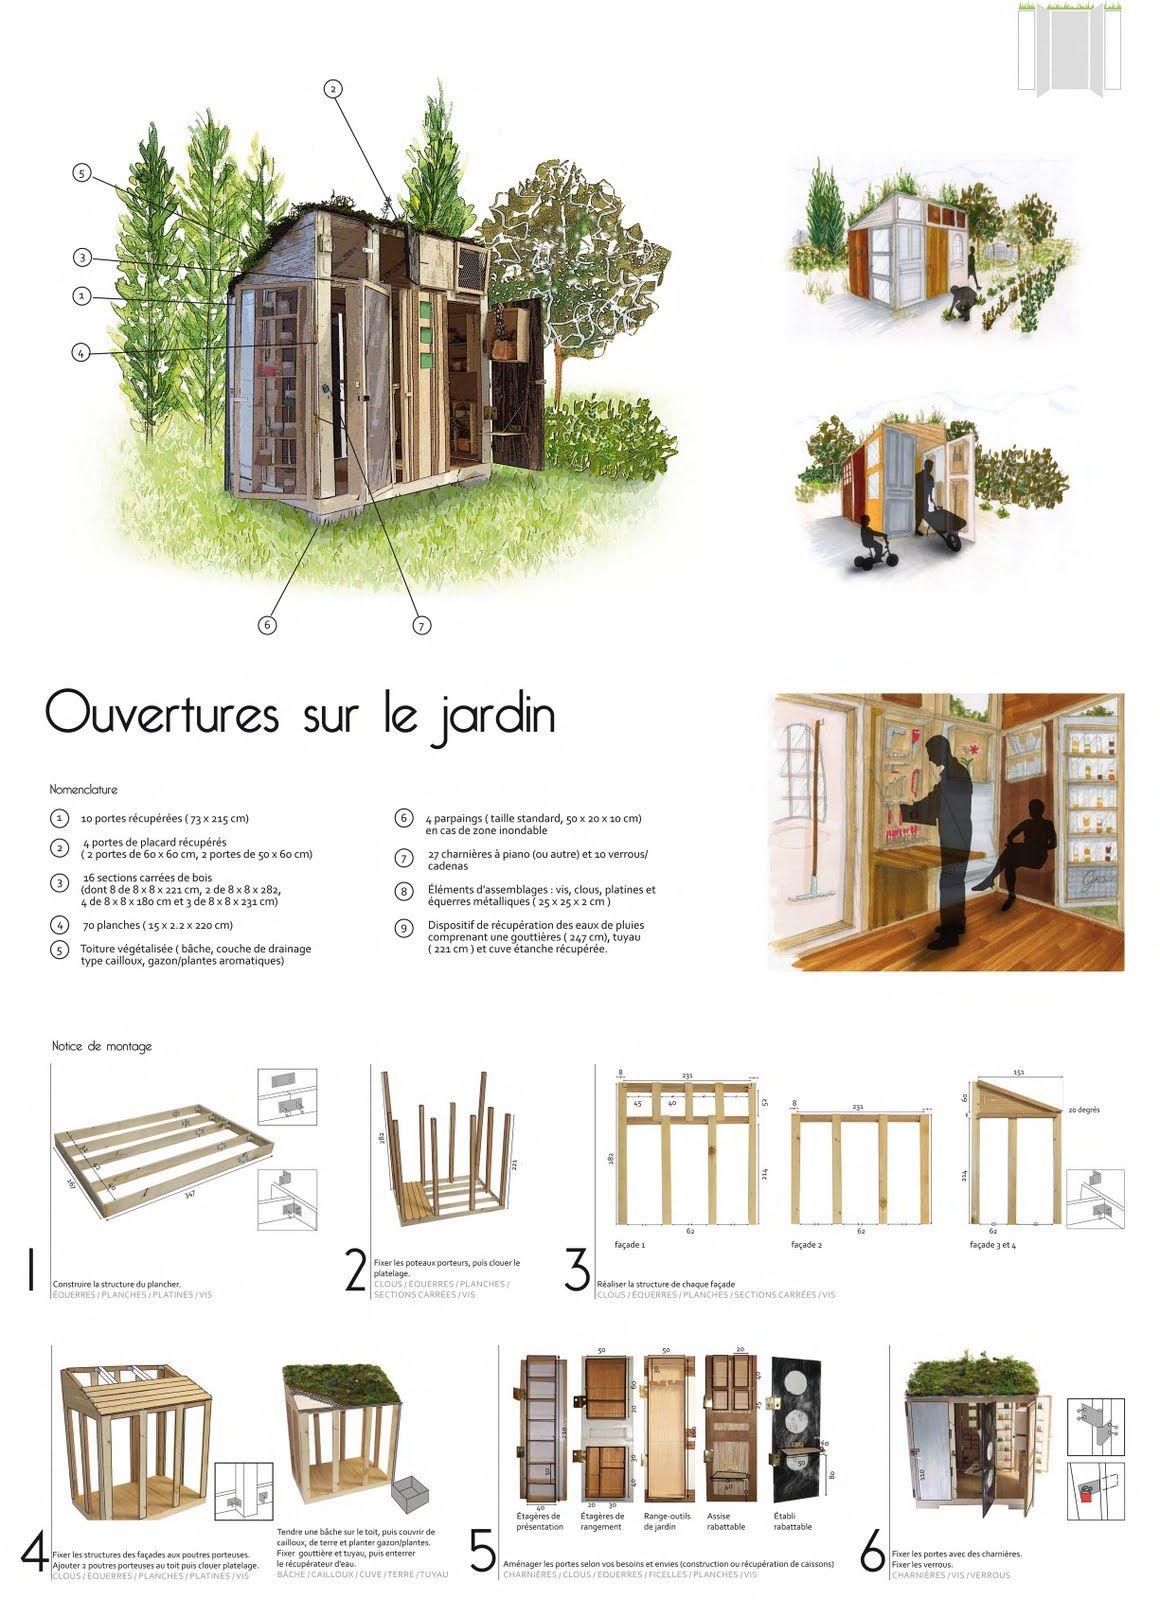 Tanatee -: 'l'abri À Bricoles' - Un Abri De Jardin À ... tout Construction Cabane De Jardin